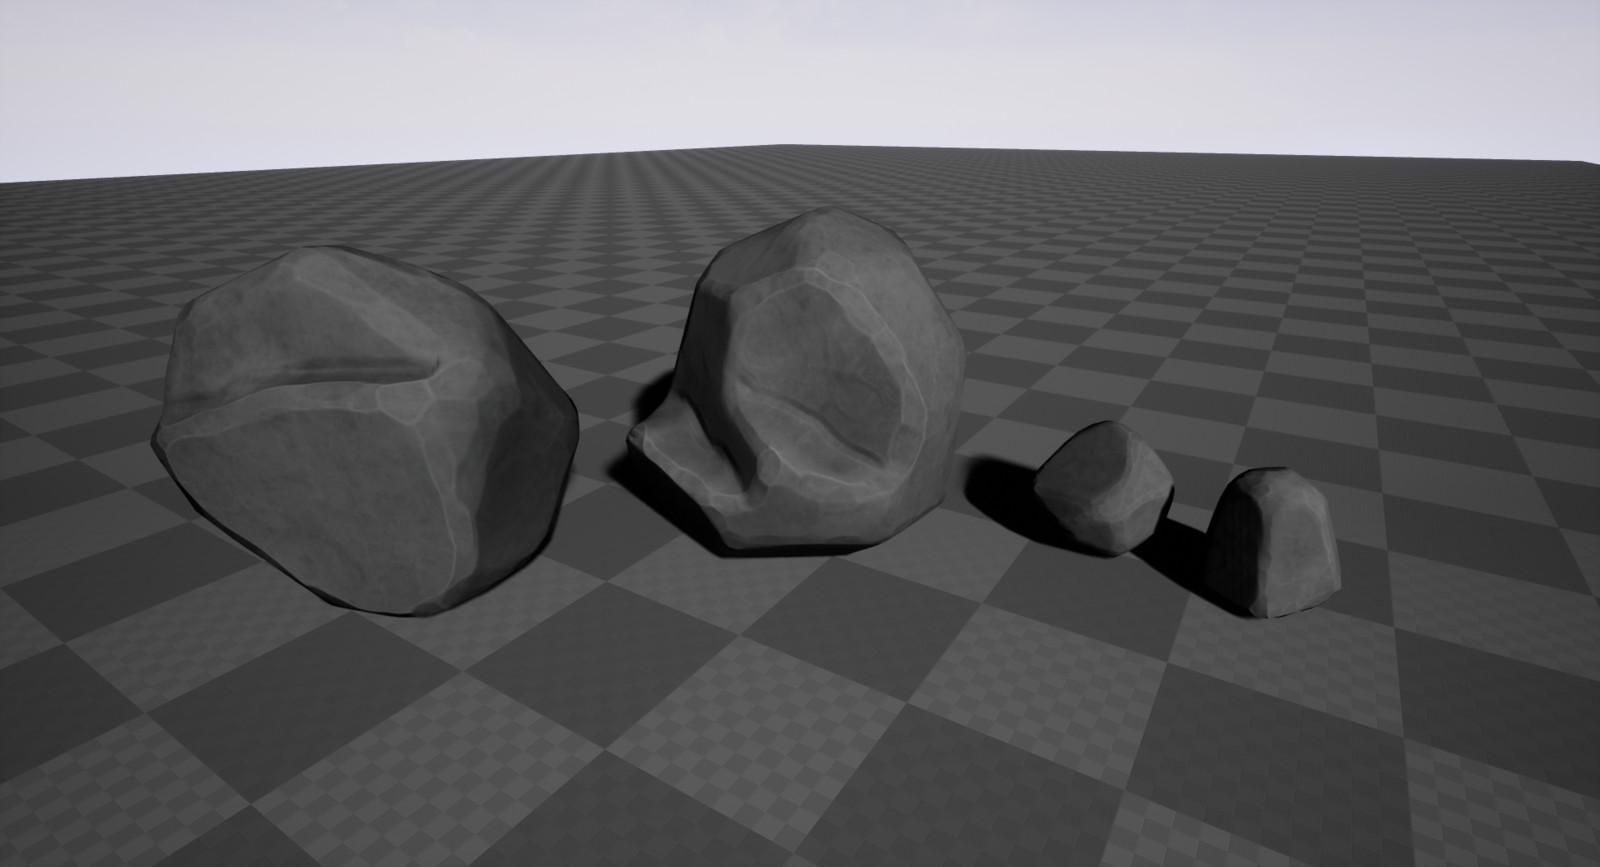 Smaller single rocks